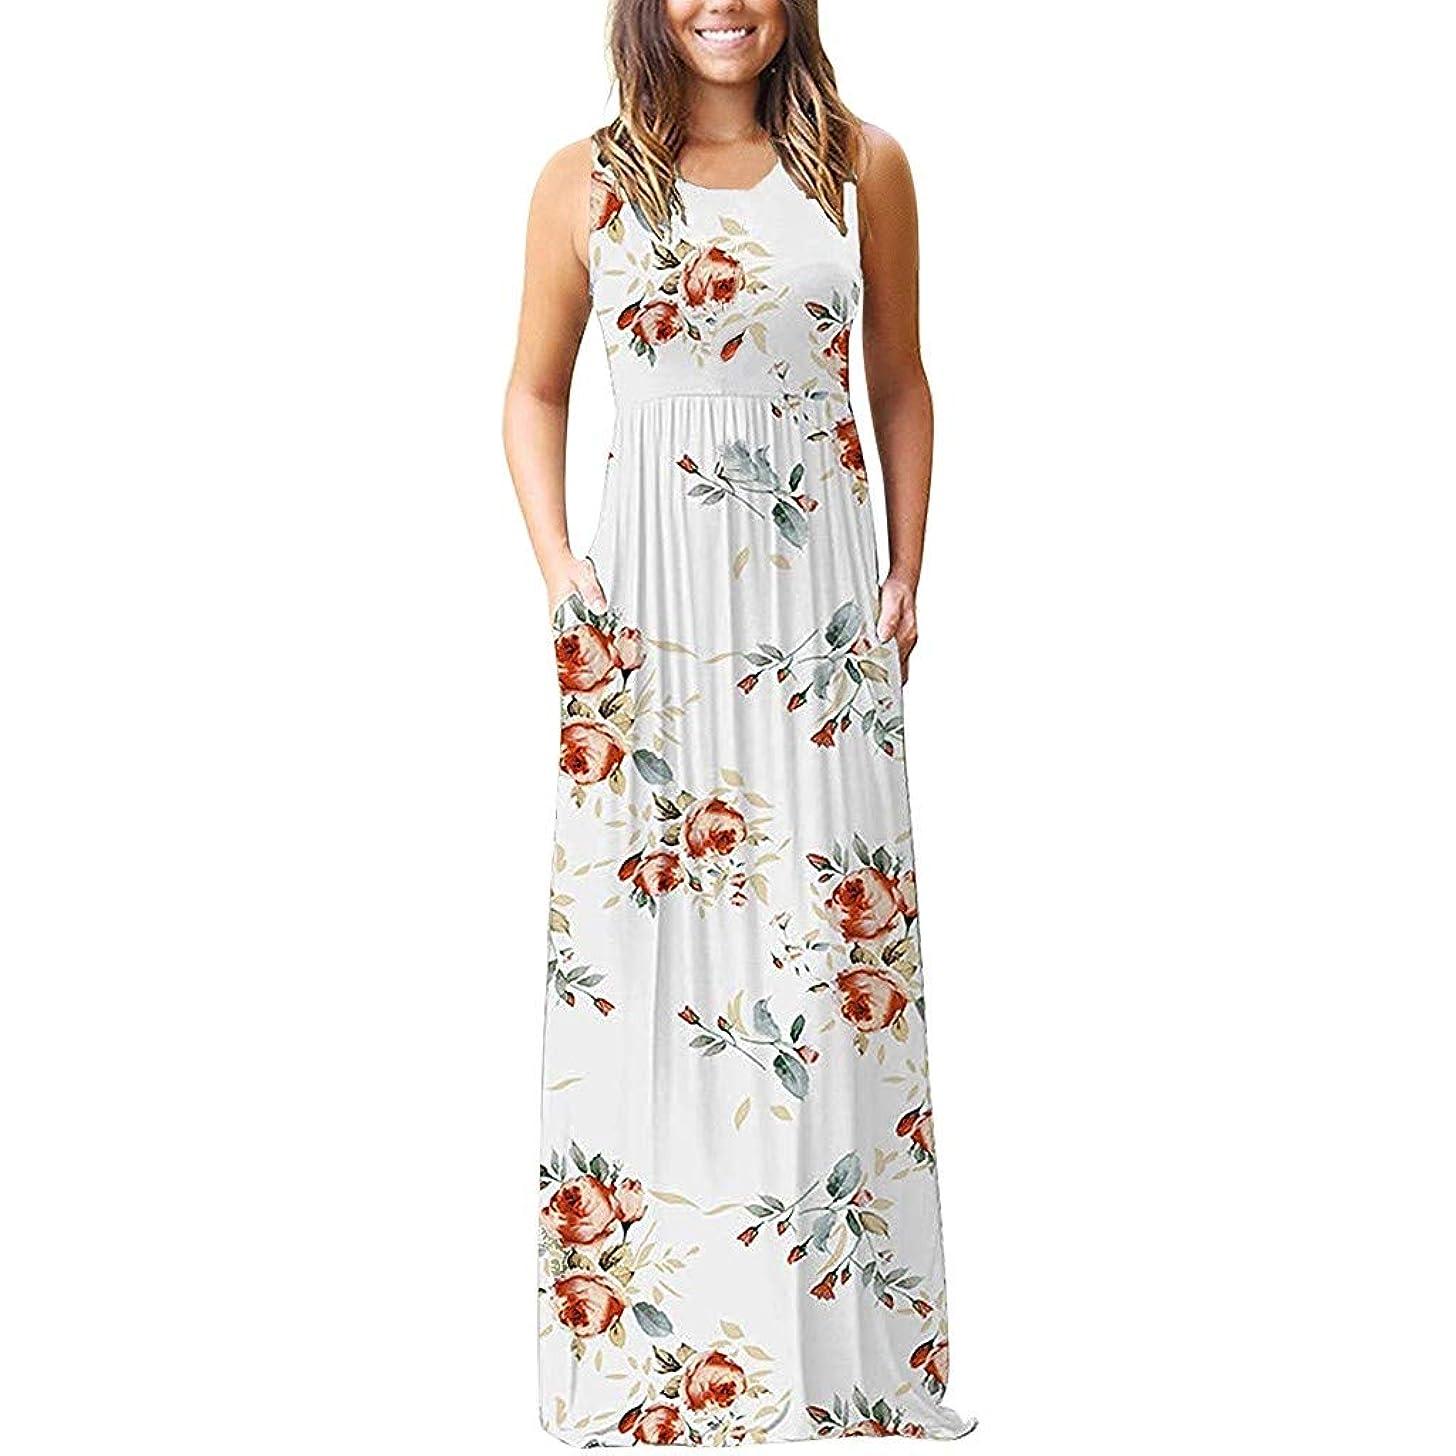 Women Sleeveless Racerback Maxi Dress Summer Casual Tank Top Print Loose Plain Holiday Long Dresses with Pockets